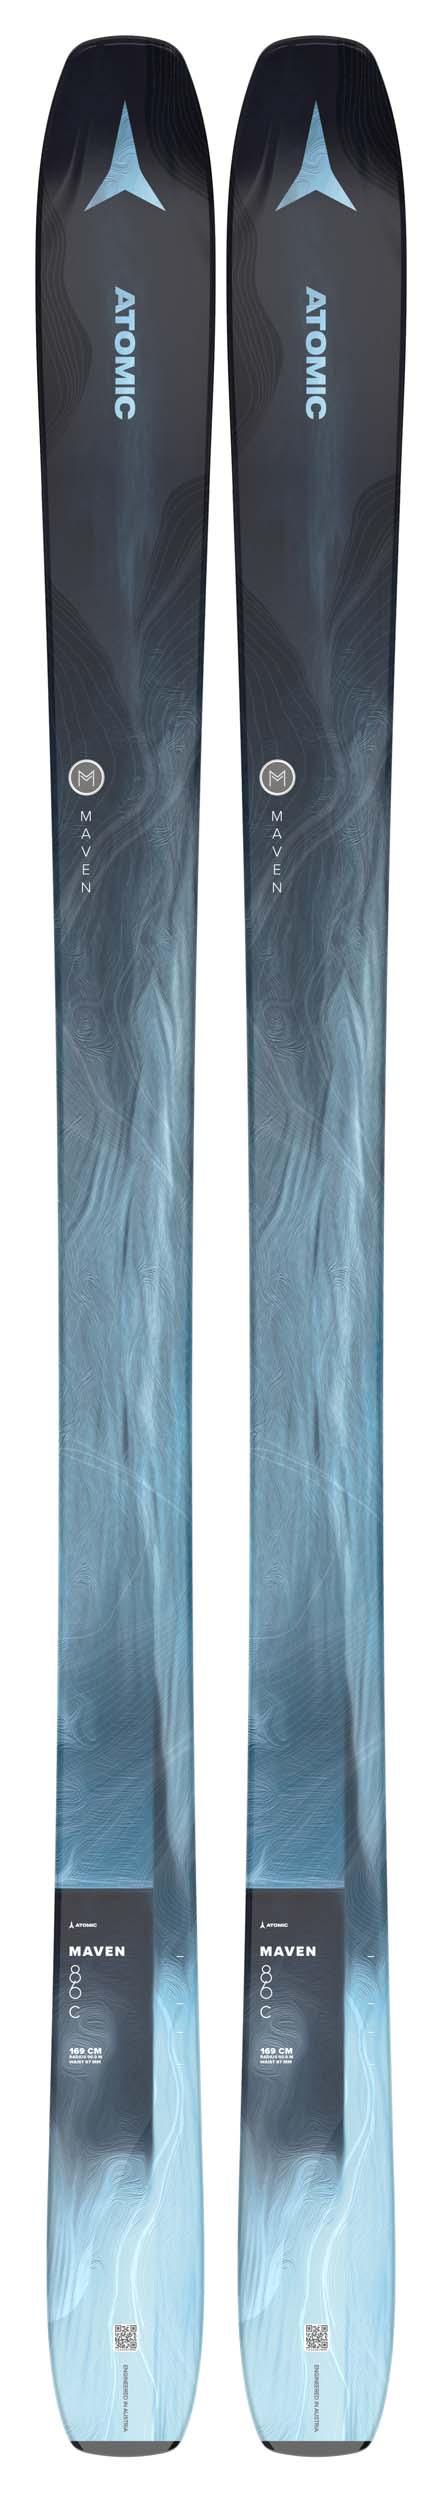 Atomic 2022 Maven 86 C Skis (Without Bindings / Flat) NEW !! 161cm